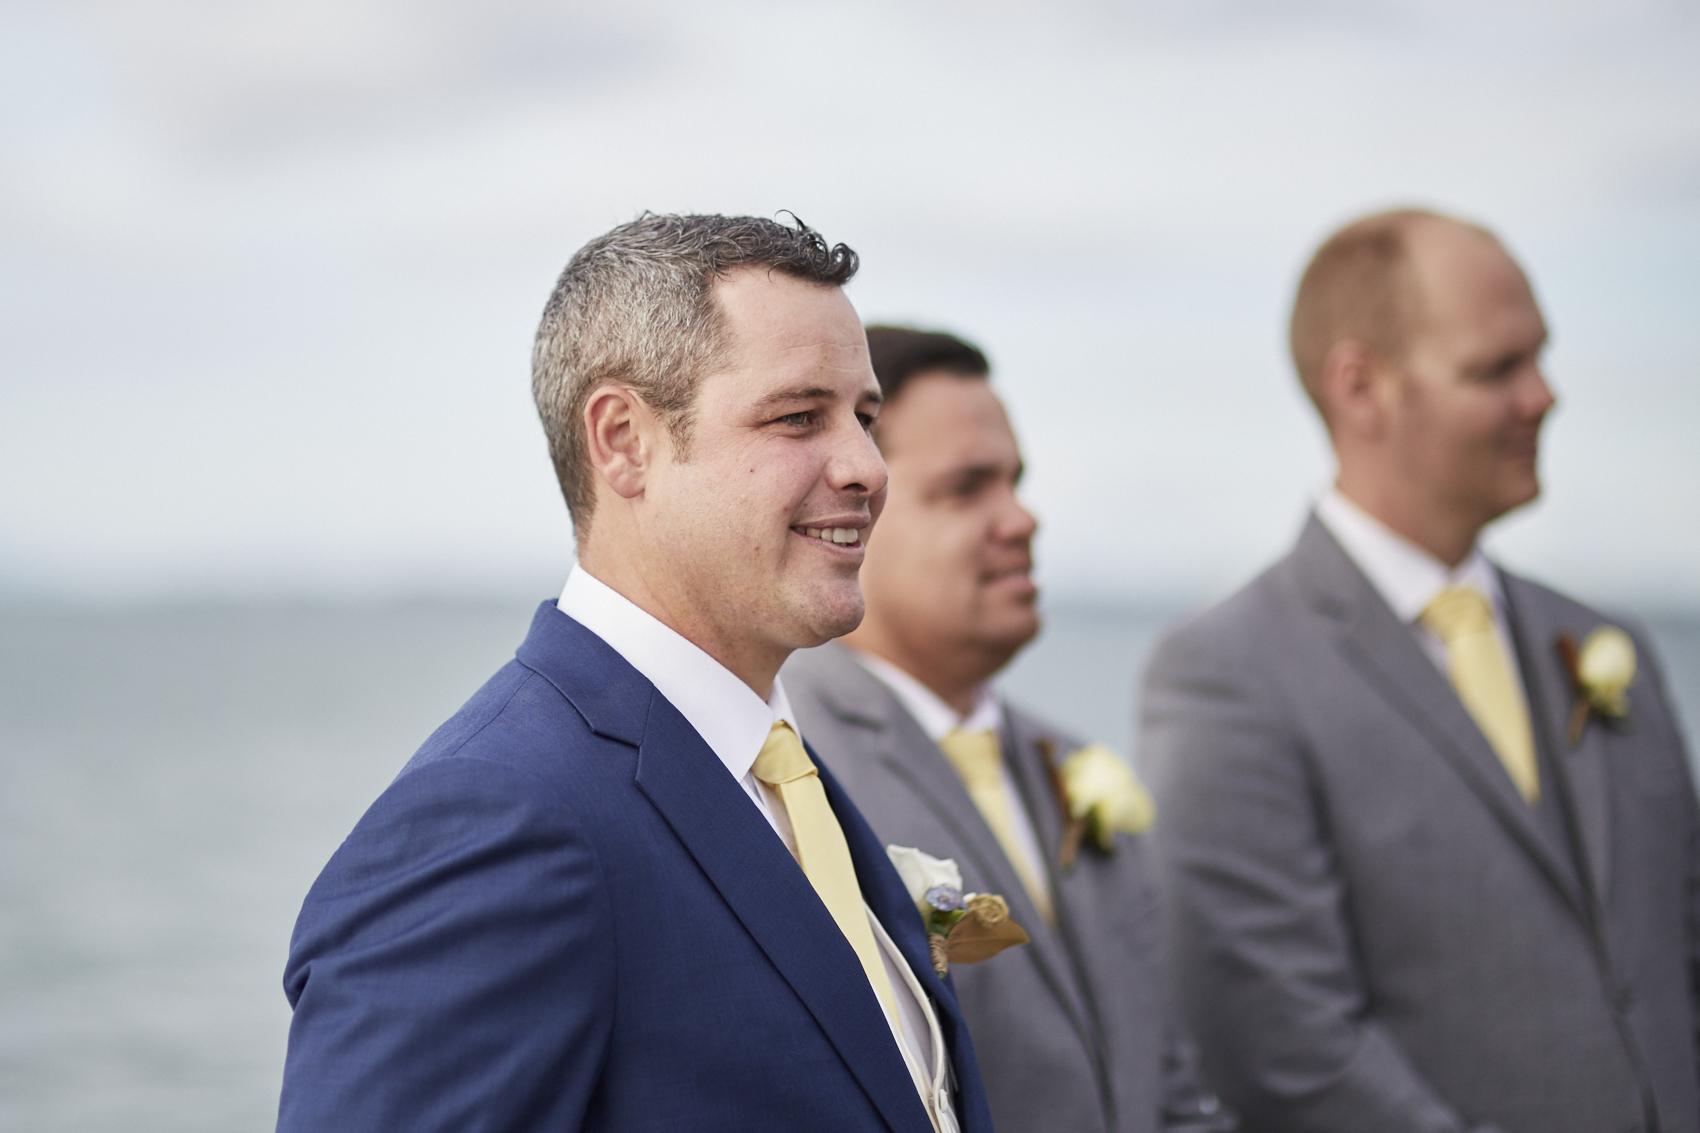 Groom watching for bride